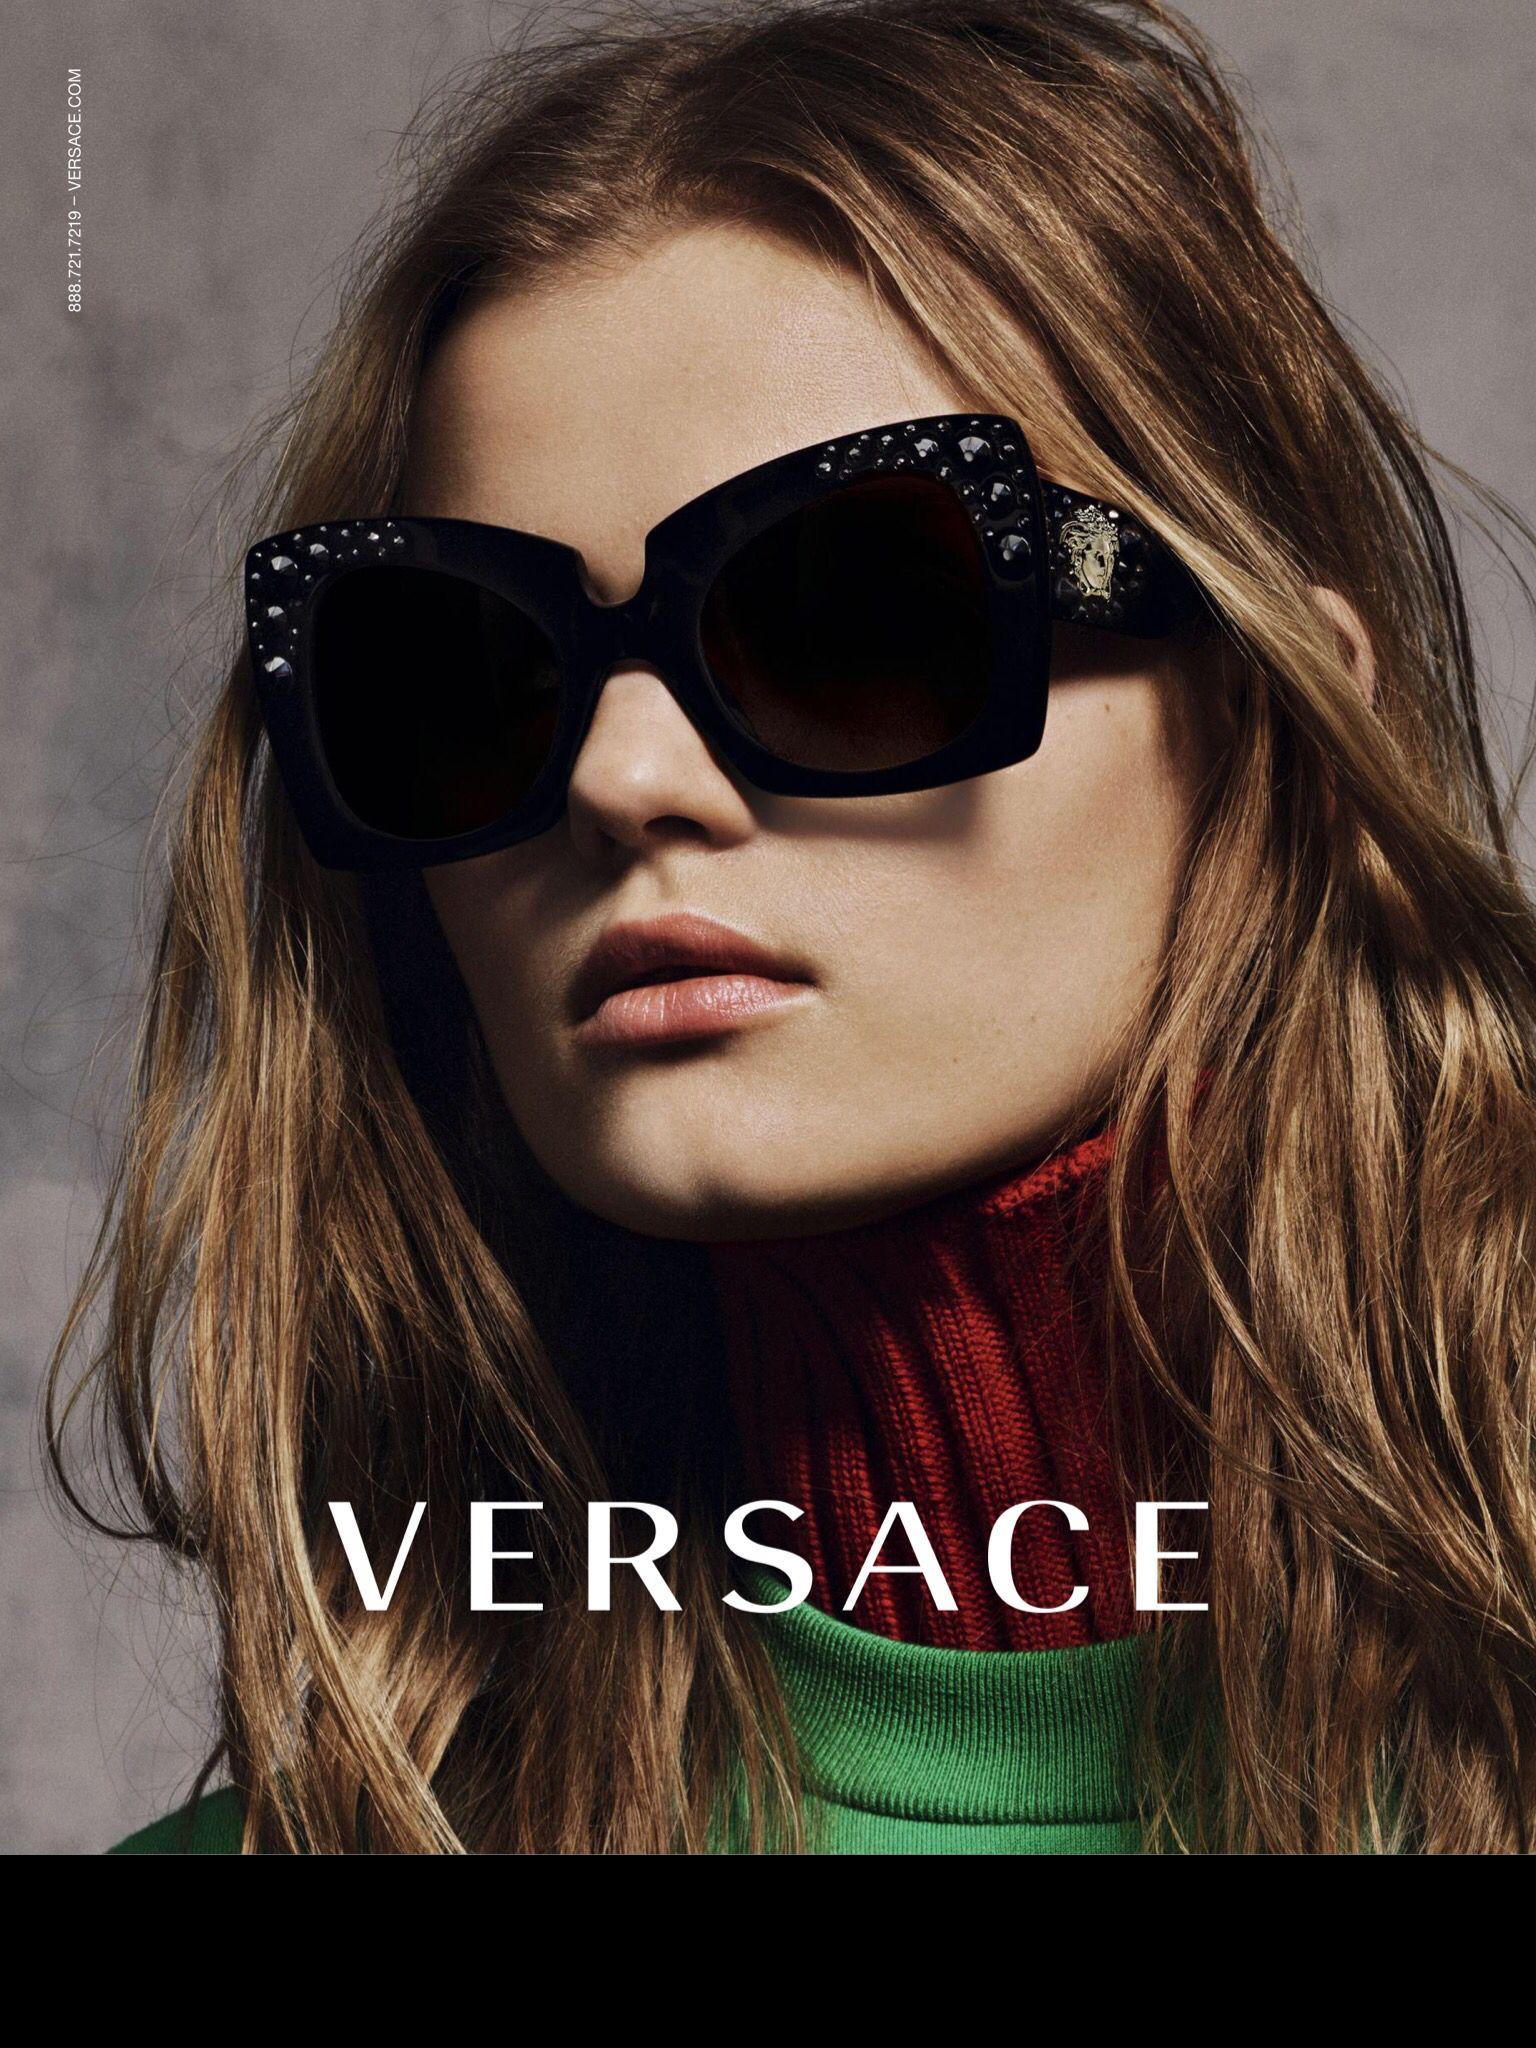 ce38f22e2cf3 VERSACE EYEWEAR | Versace | Versace eyewear, Kate grigorieva, Versace